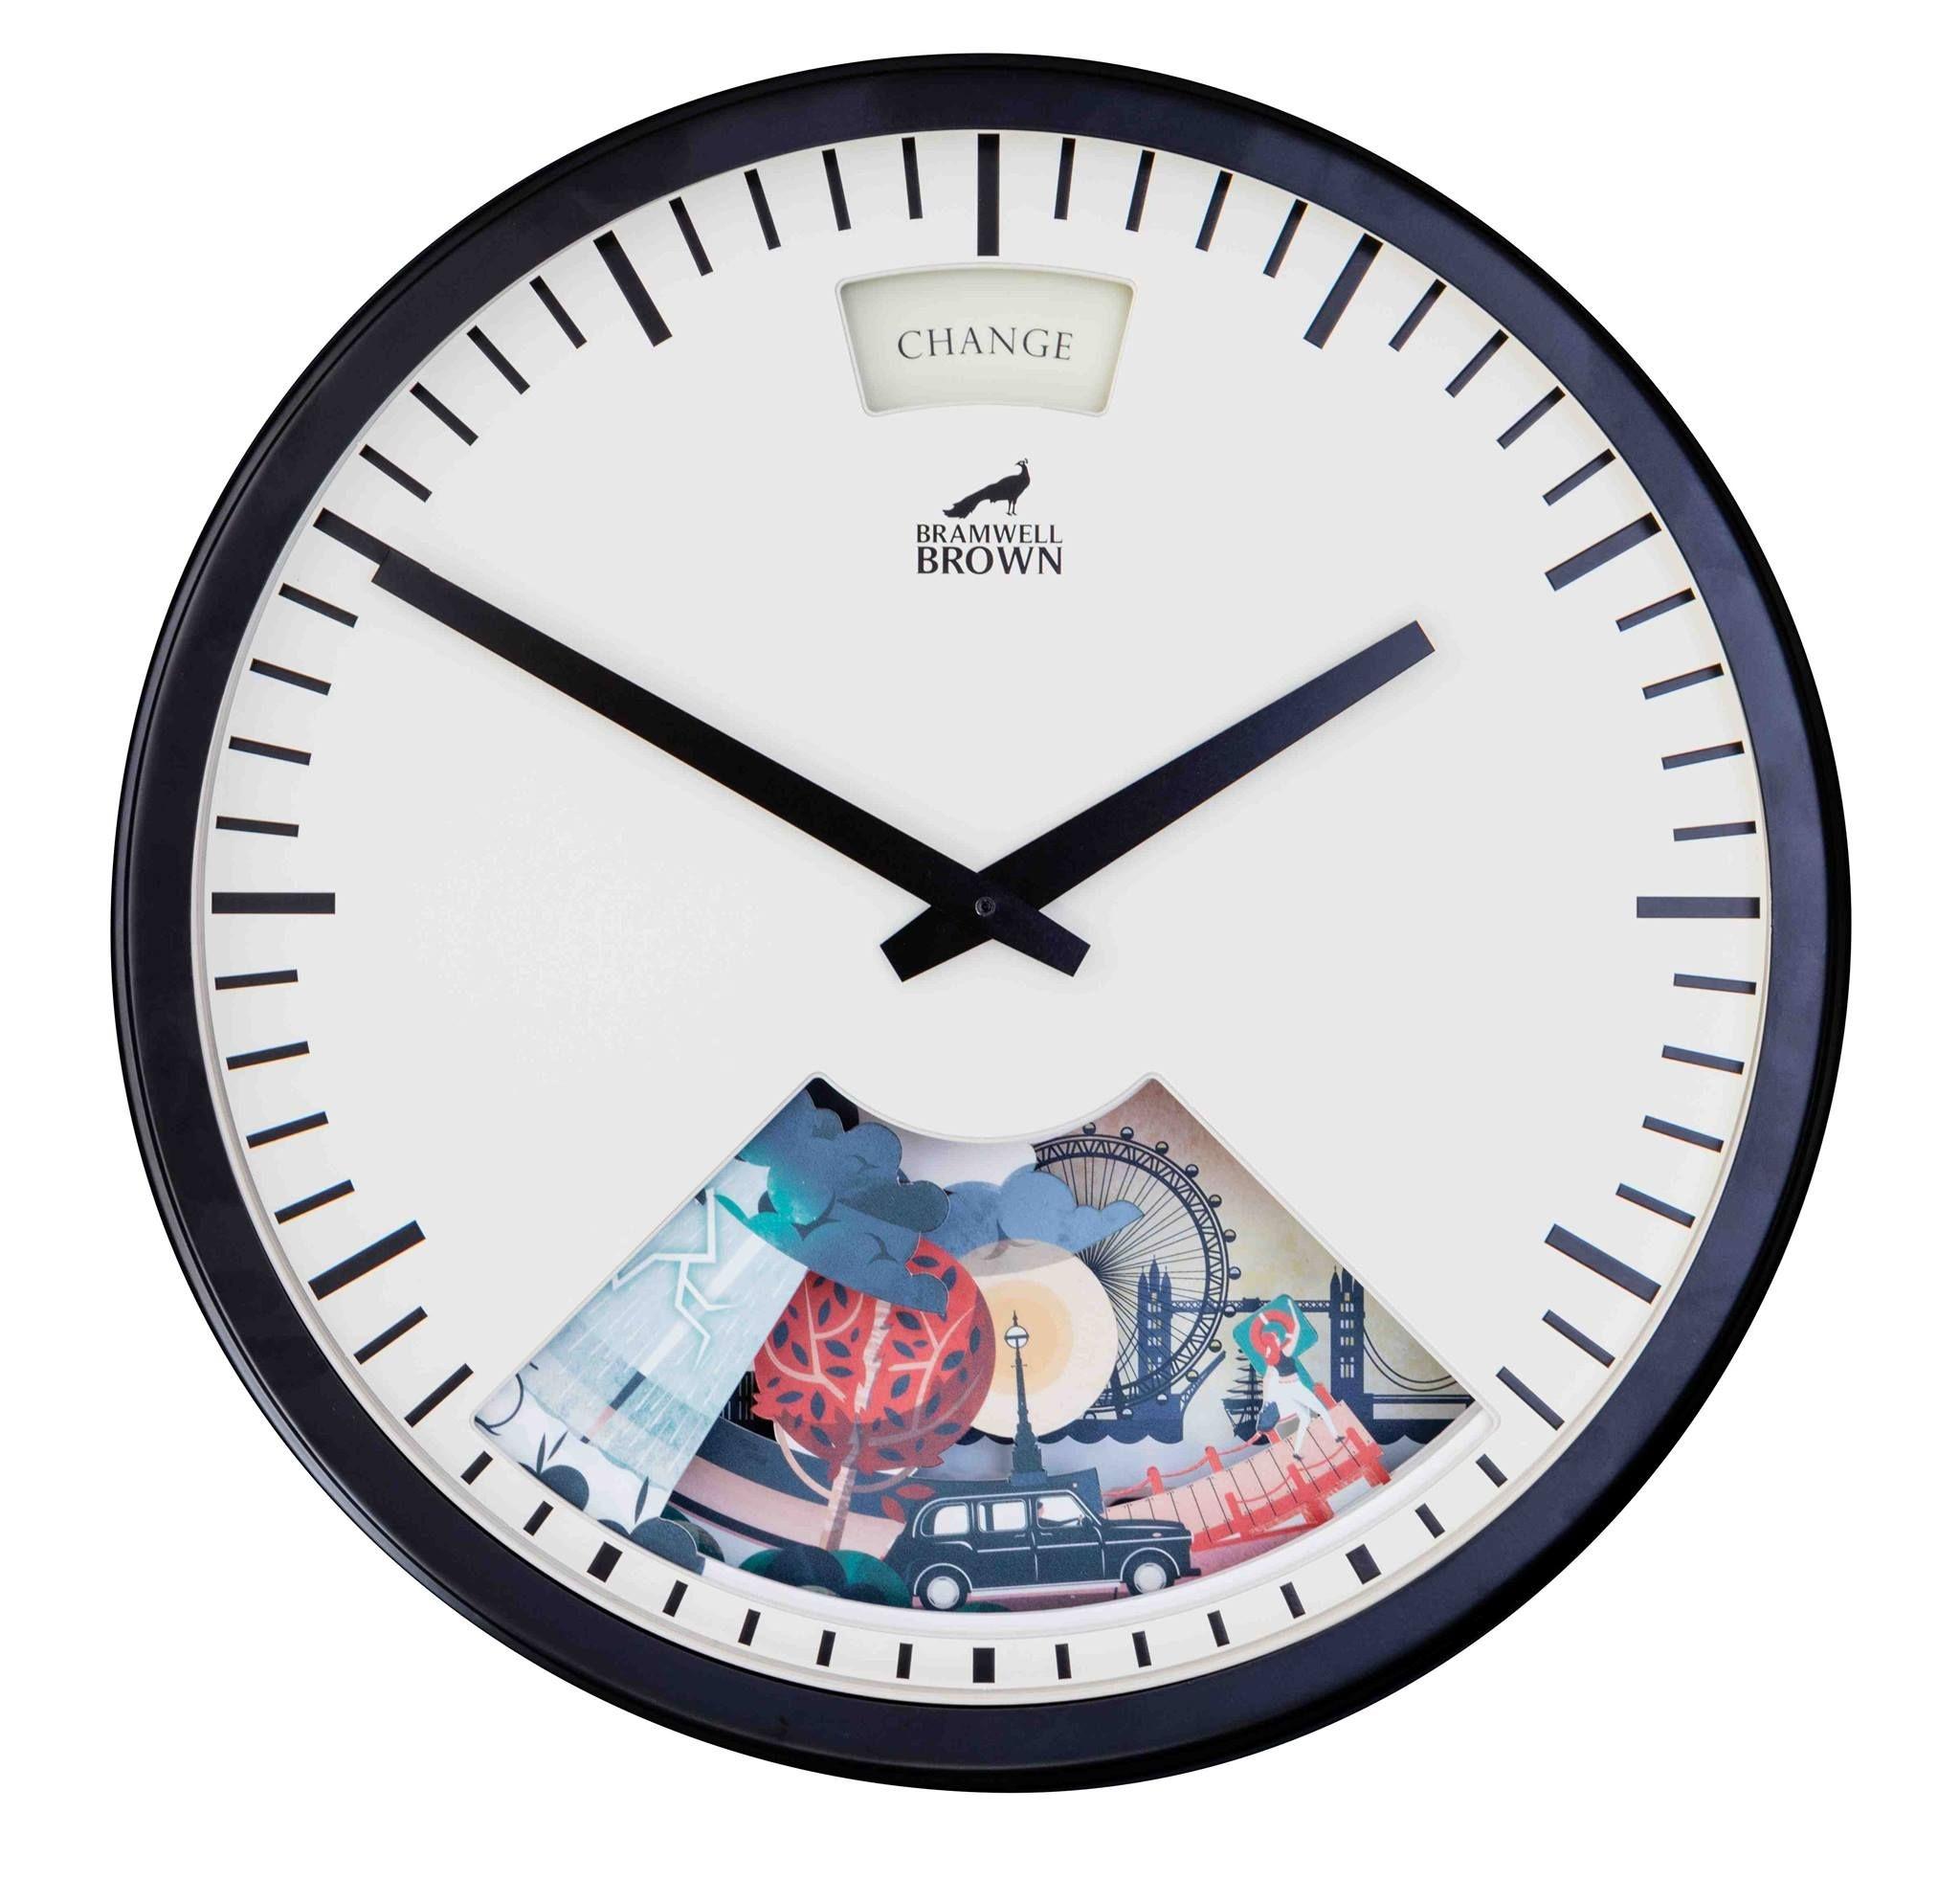 Unique Wall Clocks You Ll Love In 2021 Visualhunt